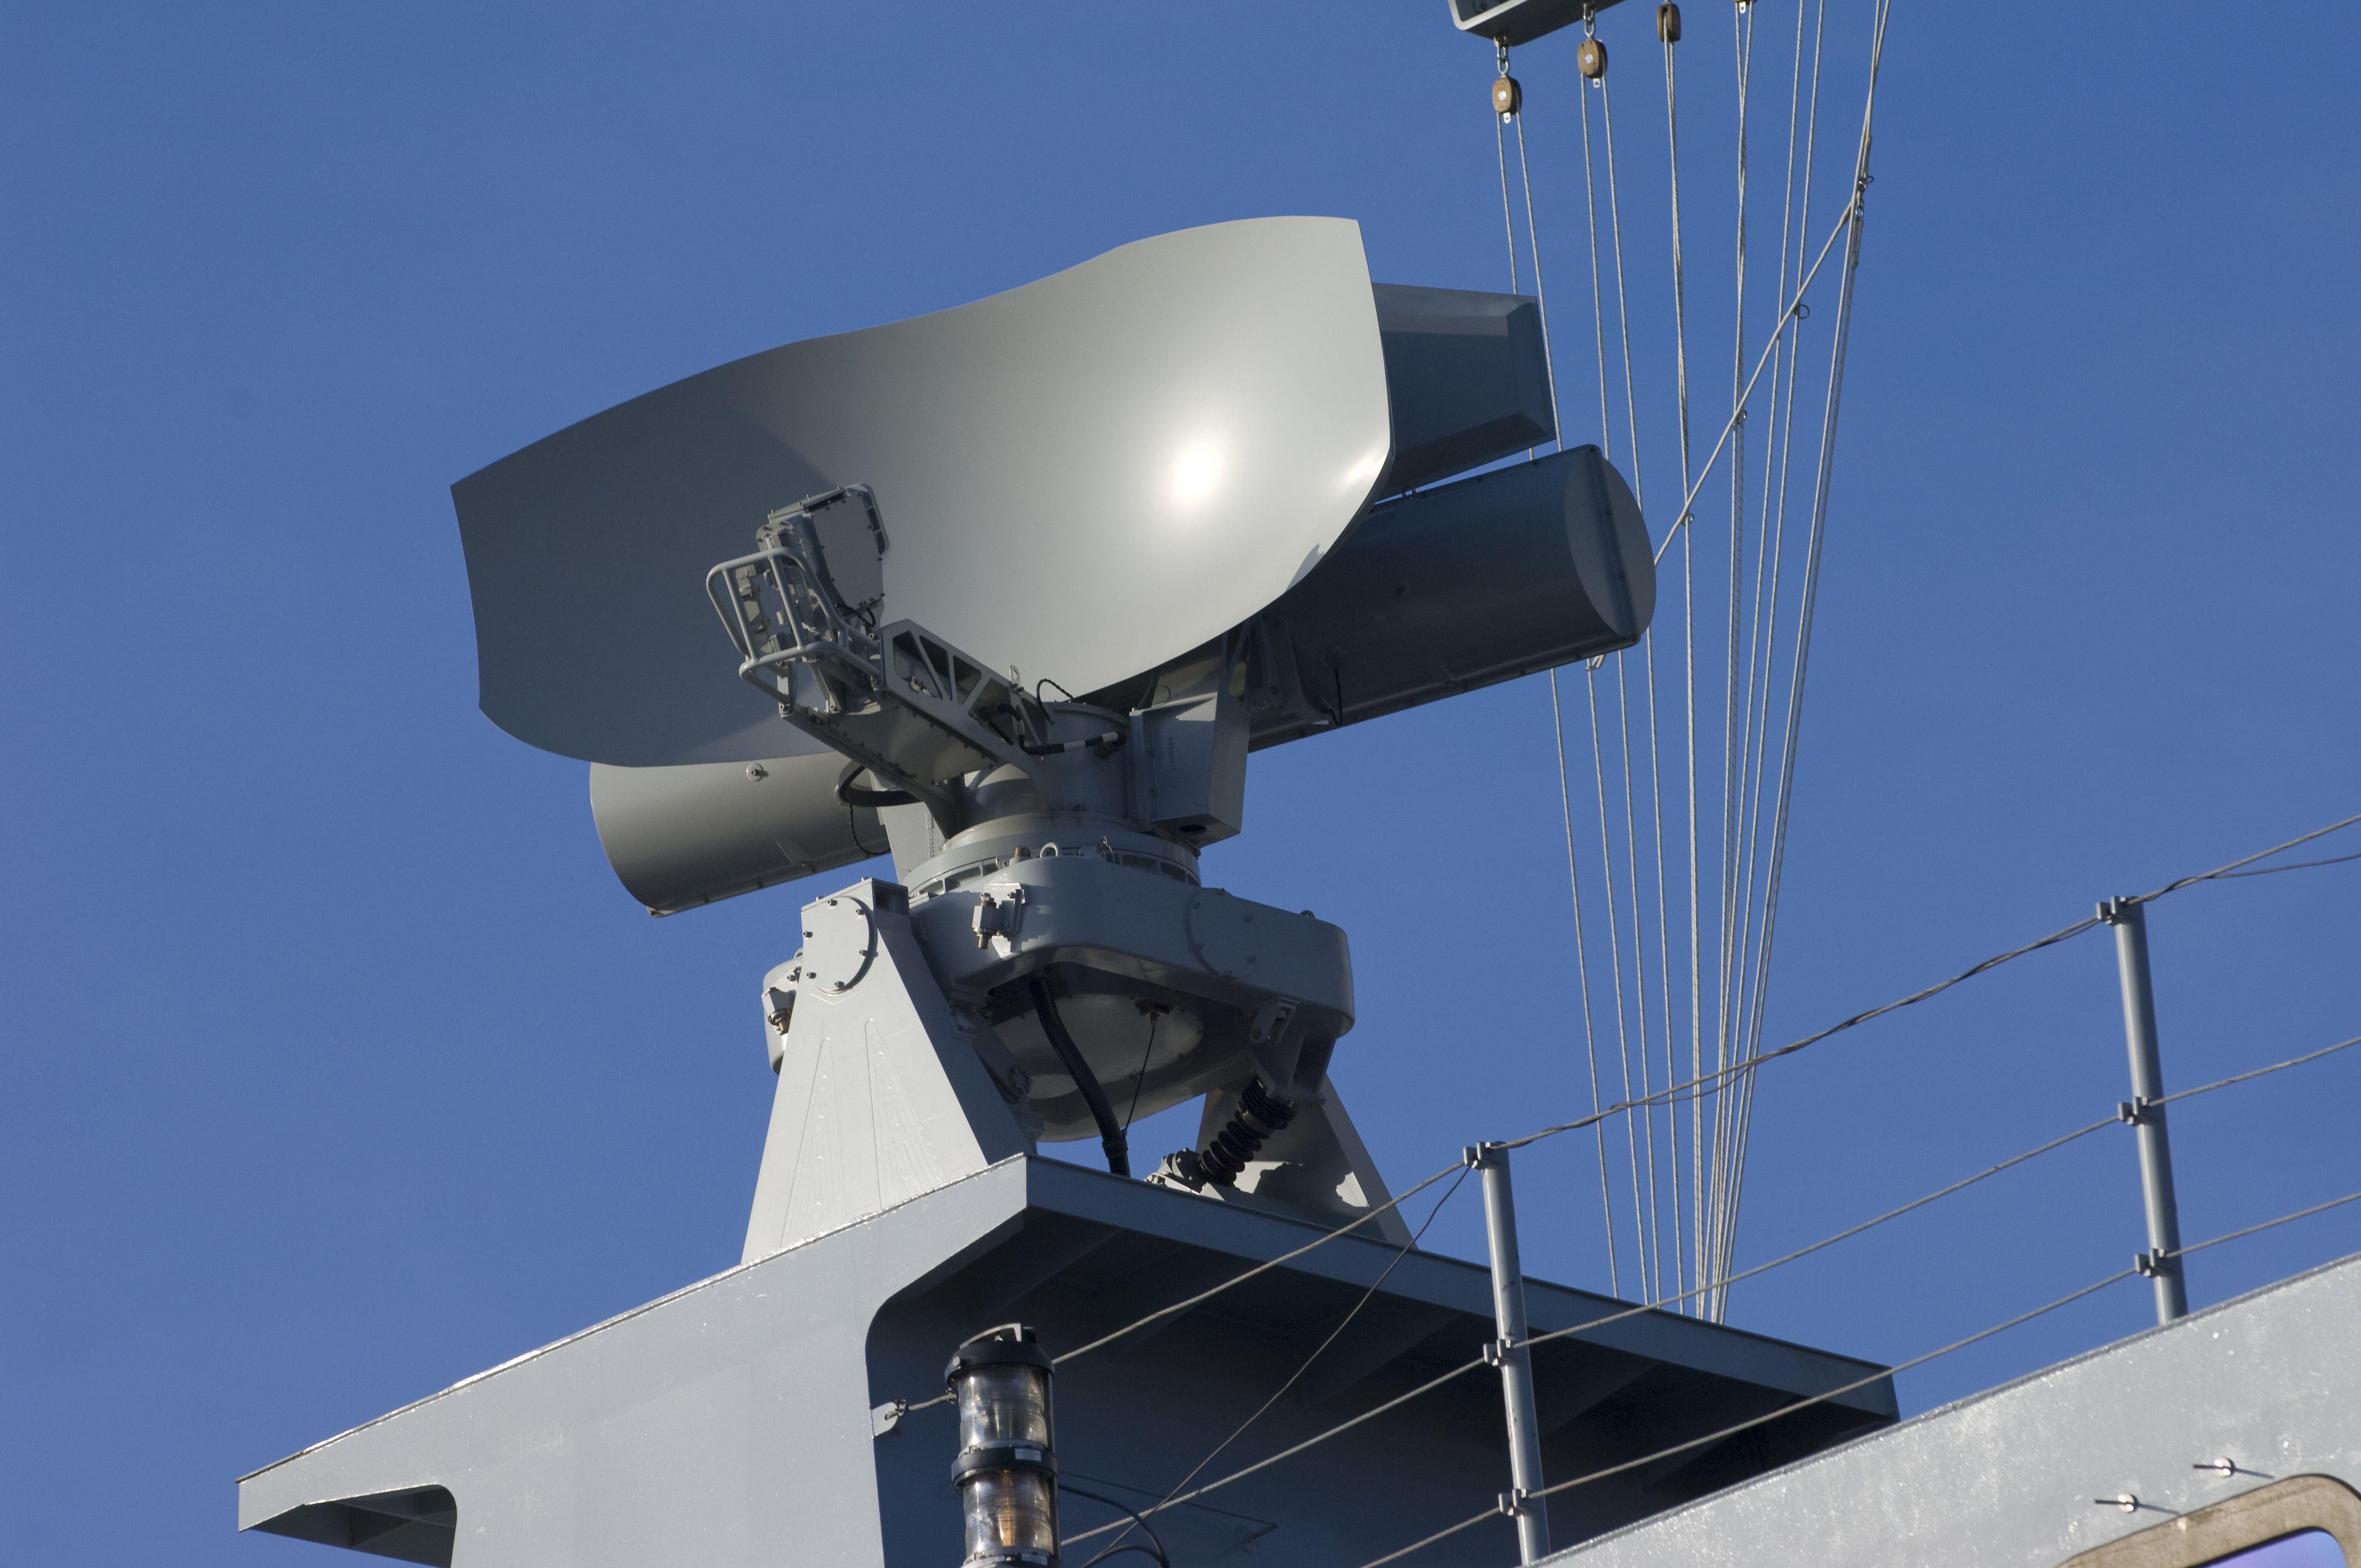 RAN30X / The surveillance radar Represents the stateof